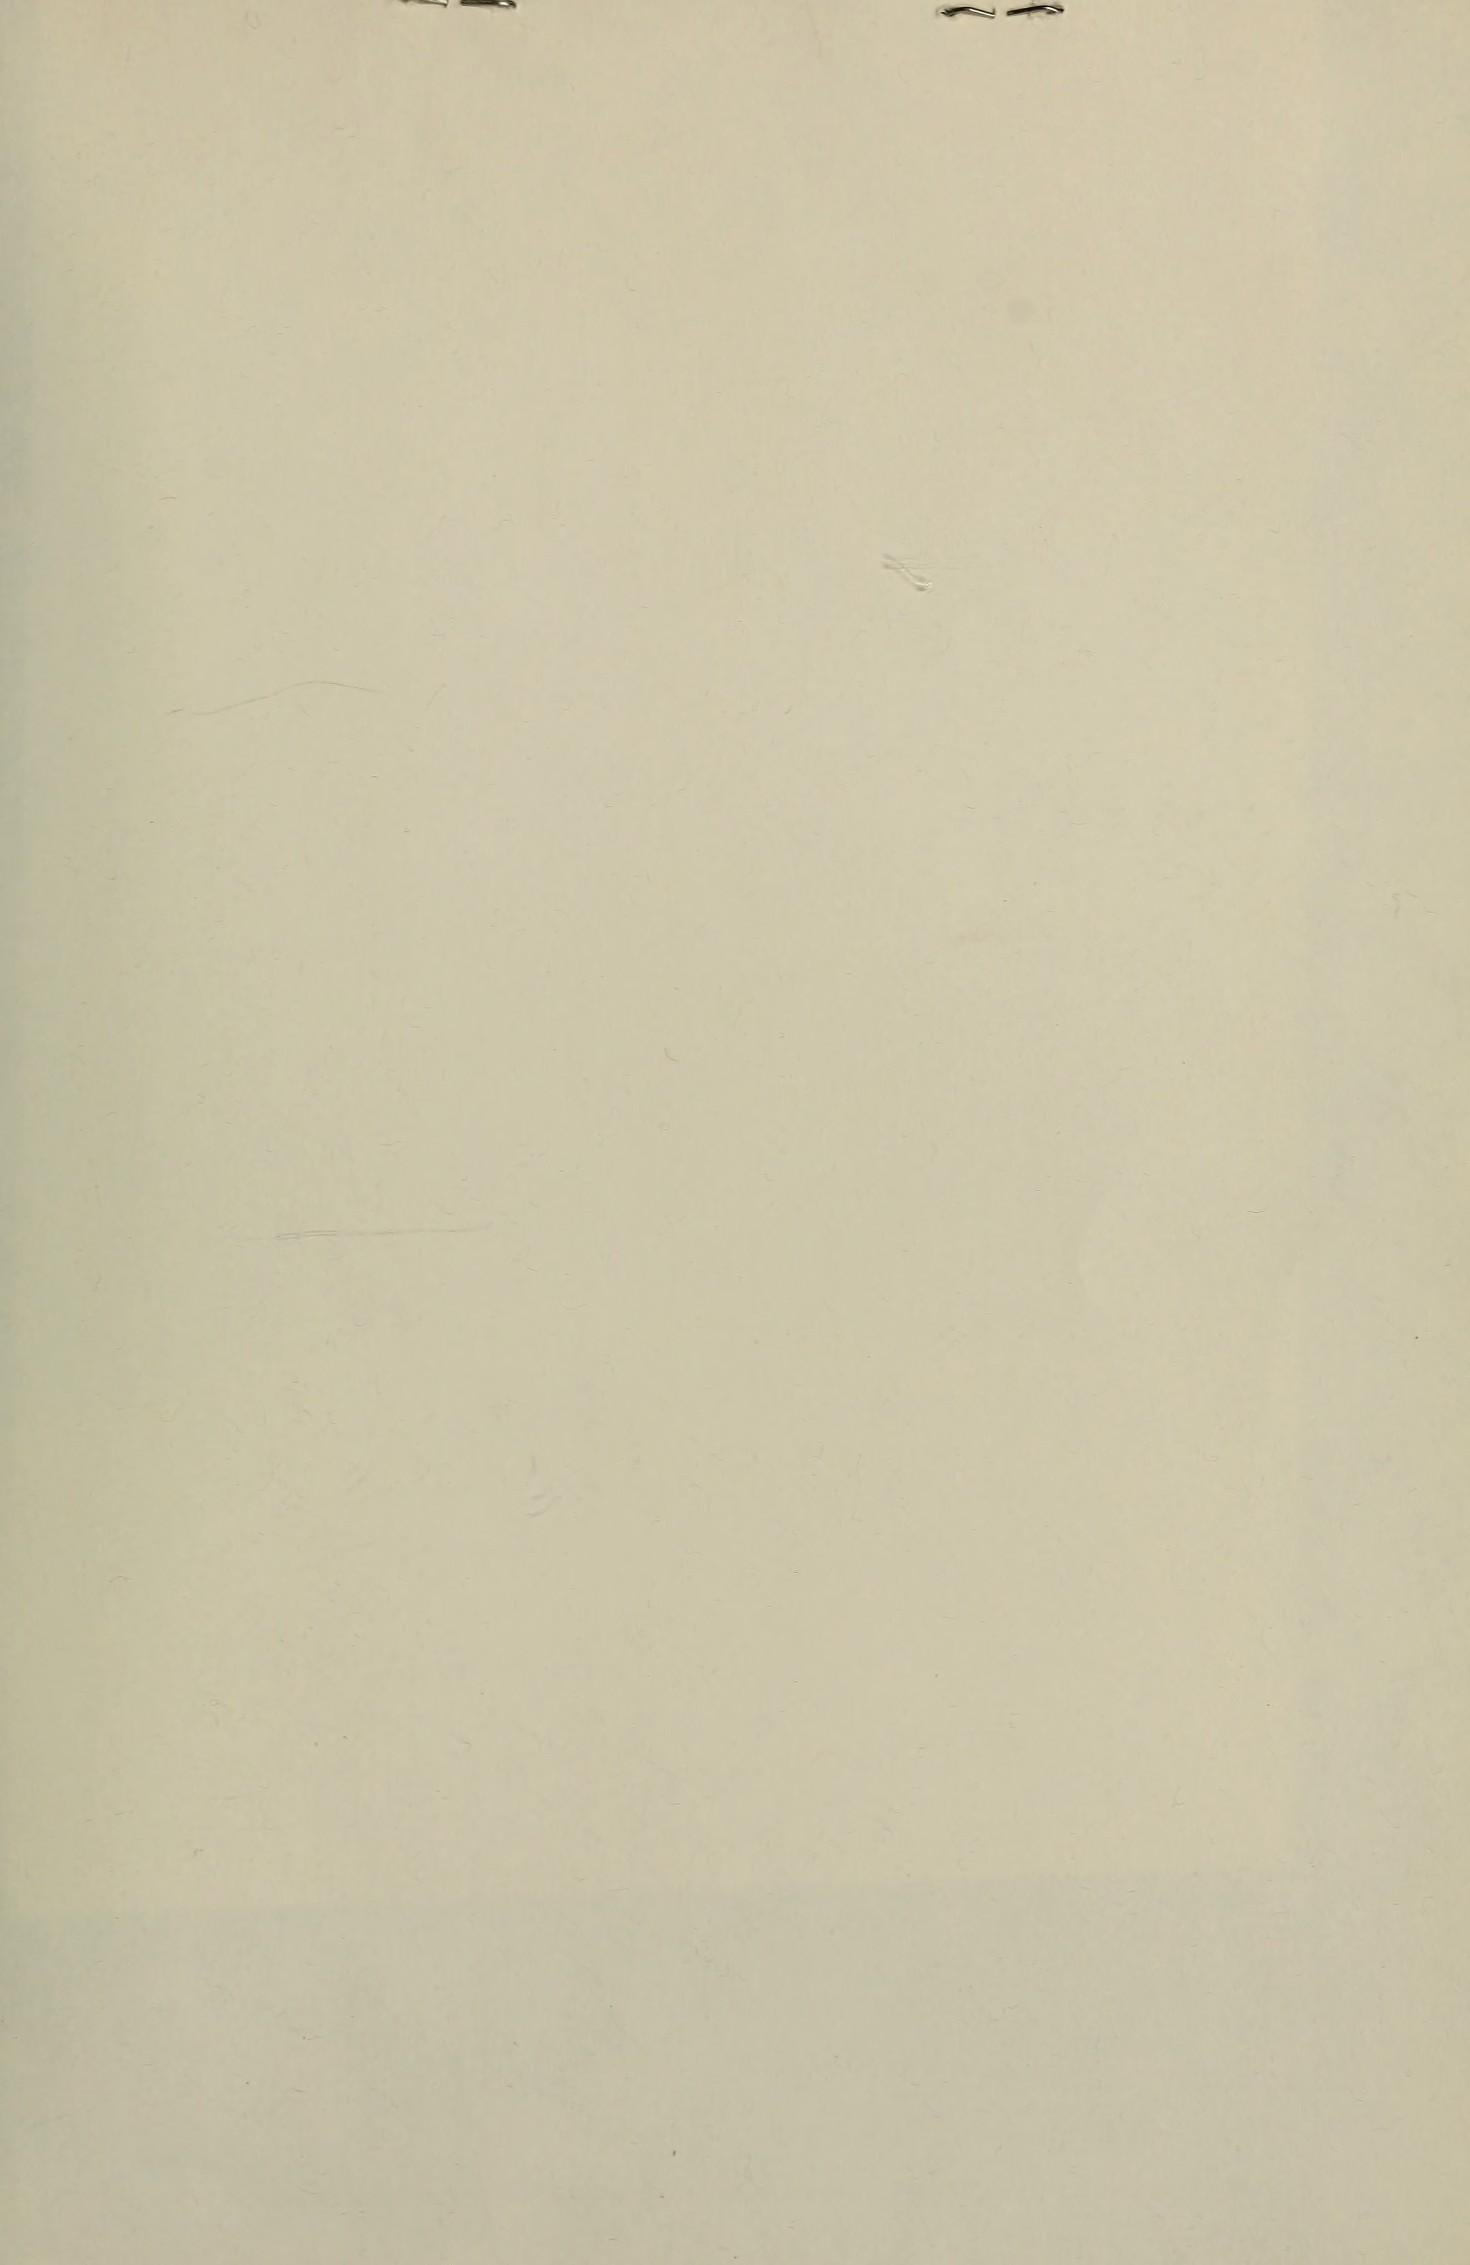 Edisonphonograph01moor_jp2.zip&file=edisonphonograph01moor_jp2%2fedisonphonograph01moor_0199